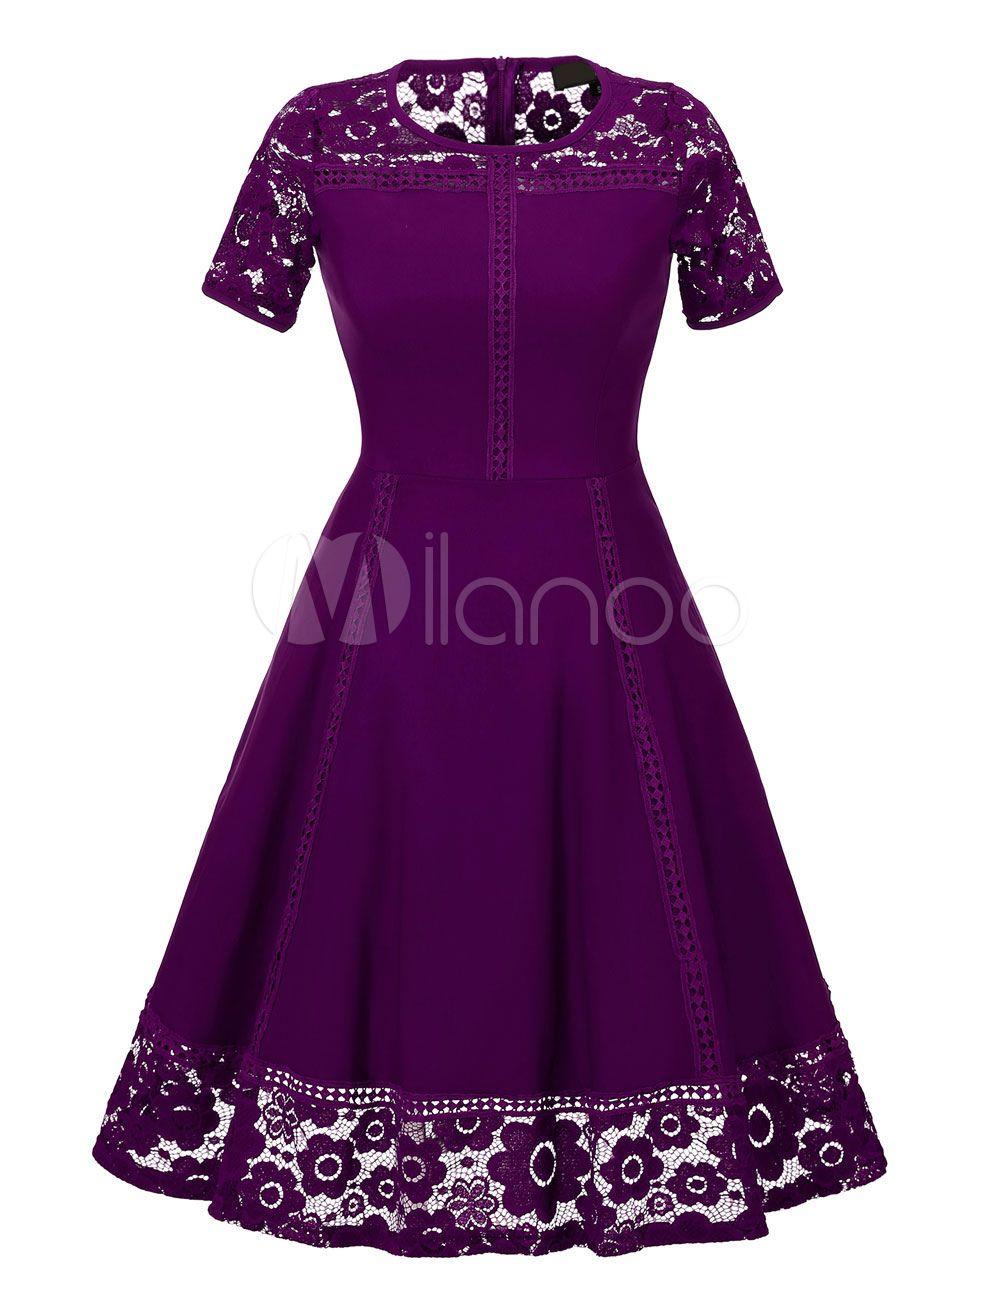 Women S Vintage Dress Purple Lace Patch Short Sleeve Pleated Retro Flare Dress Womens Vintage Dresses Summer Dresses For Women Vintage Dresses [ 1316 x 1000 Pixel ]